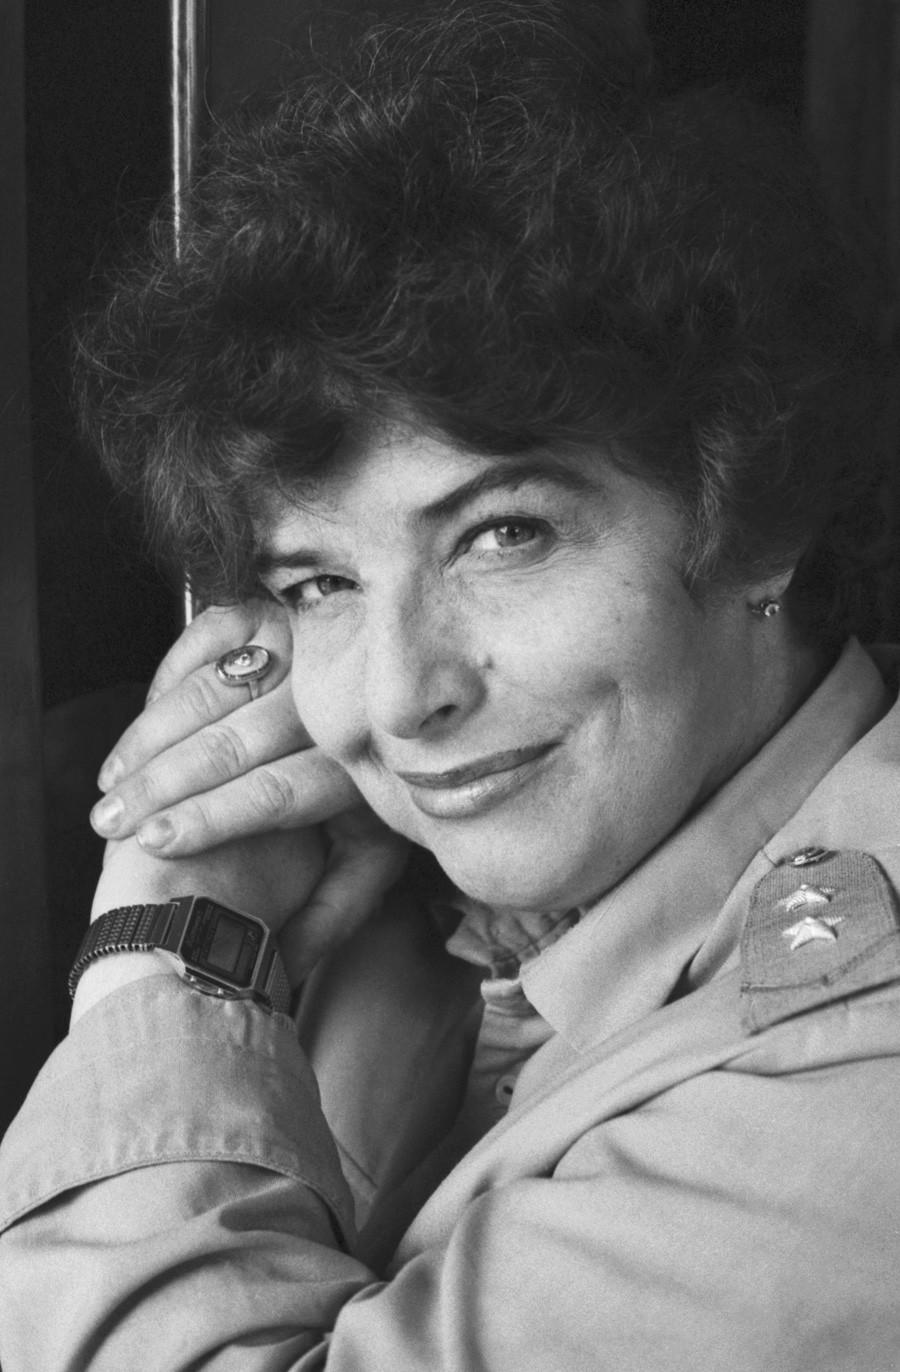 Maquinista del metro de Moscú, Tamara Aranchi, el 8 de junio de 1989.